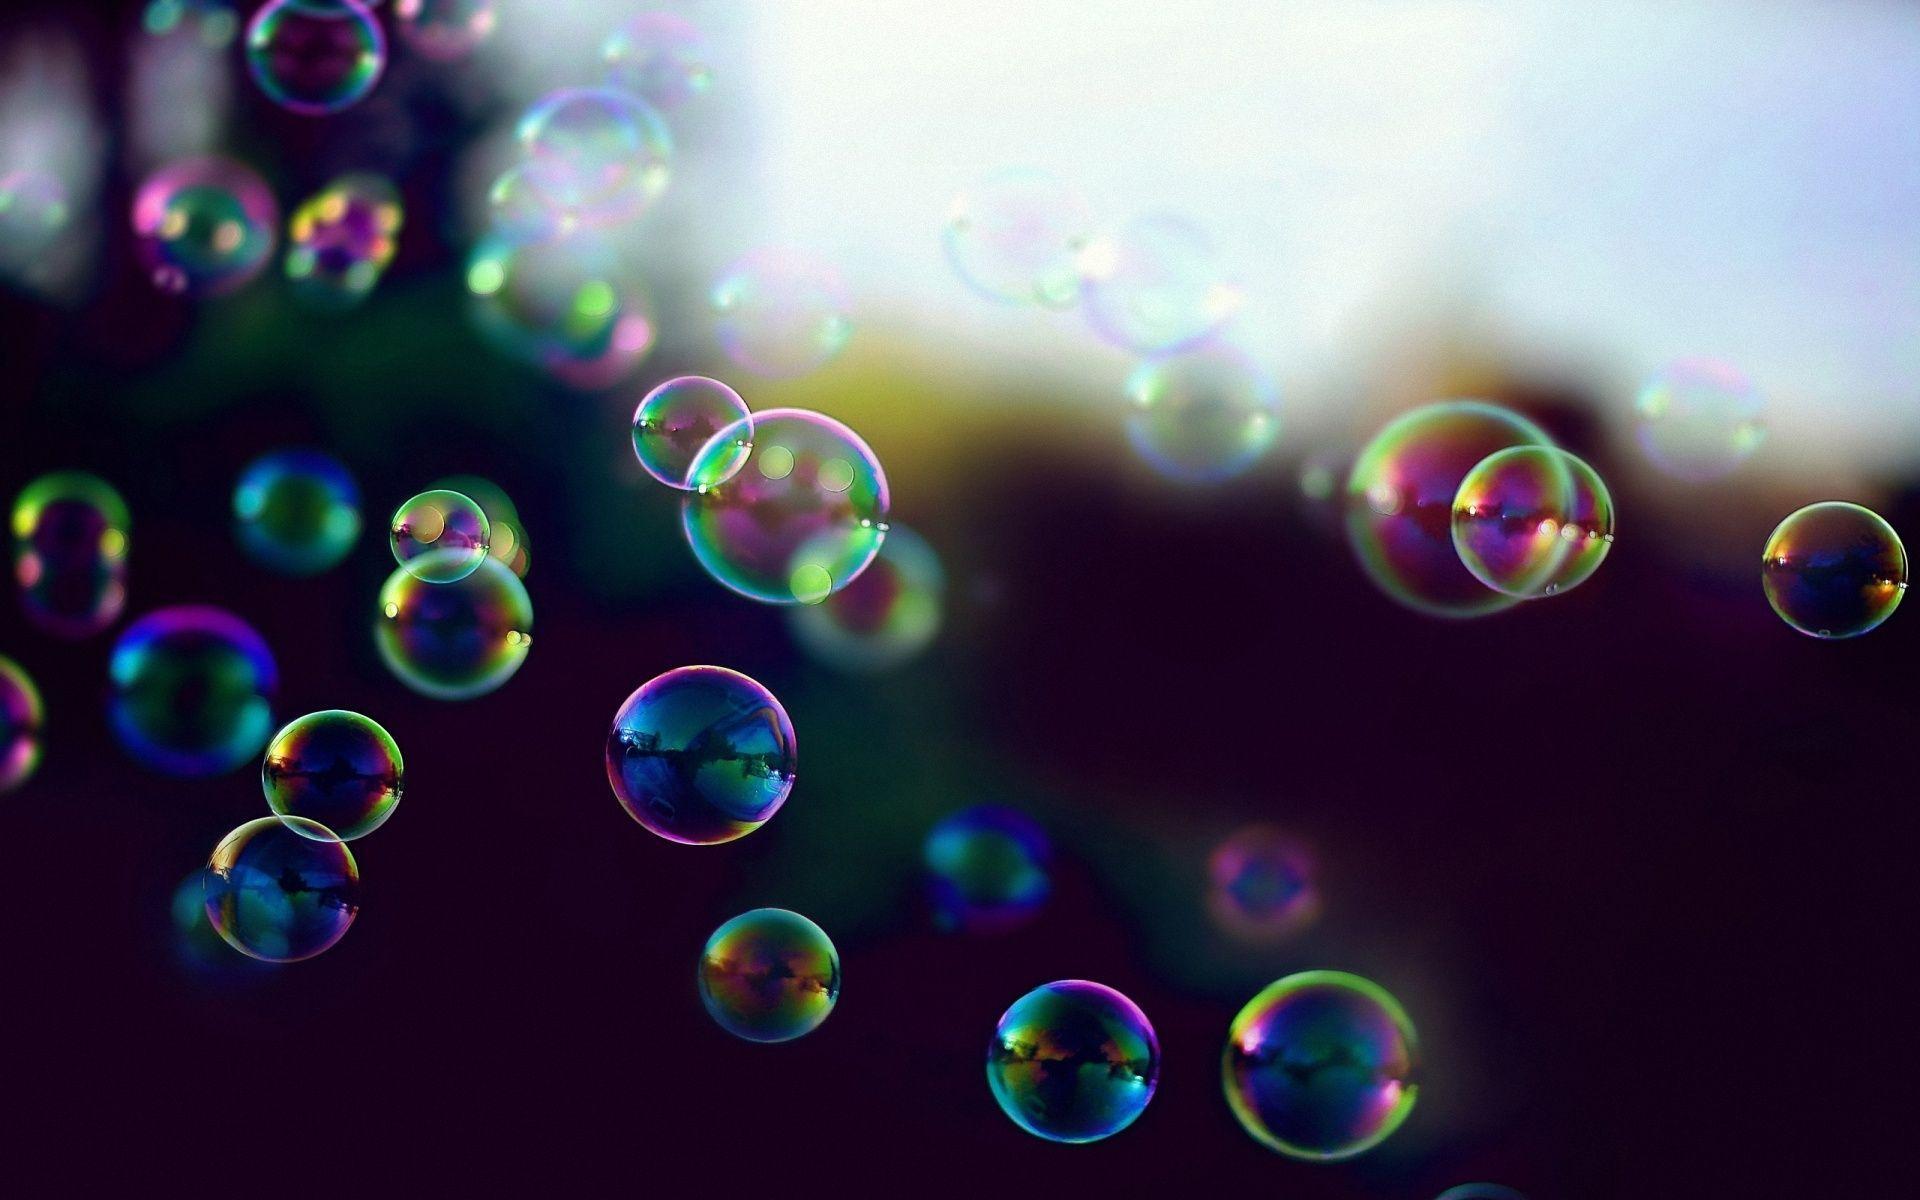 Soap Bubble Wallpaper Photos Hd Of Laptop Bubbles Gipsypixel